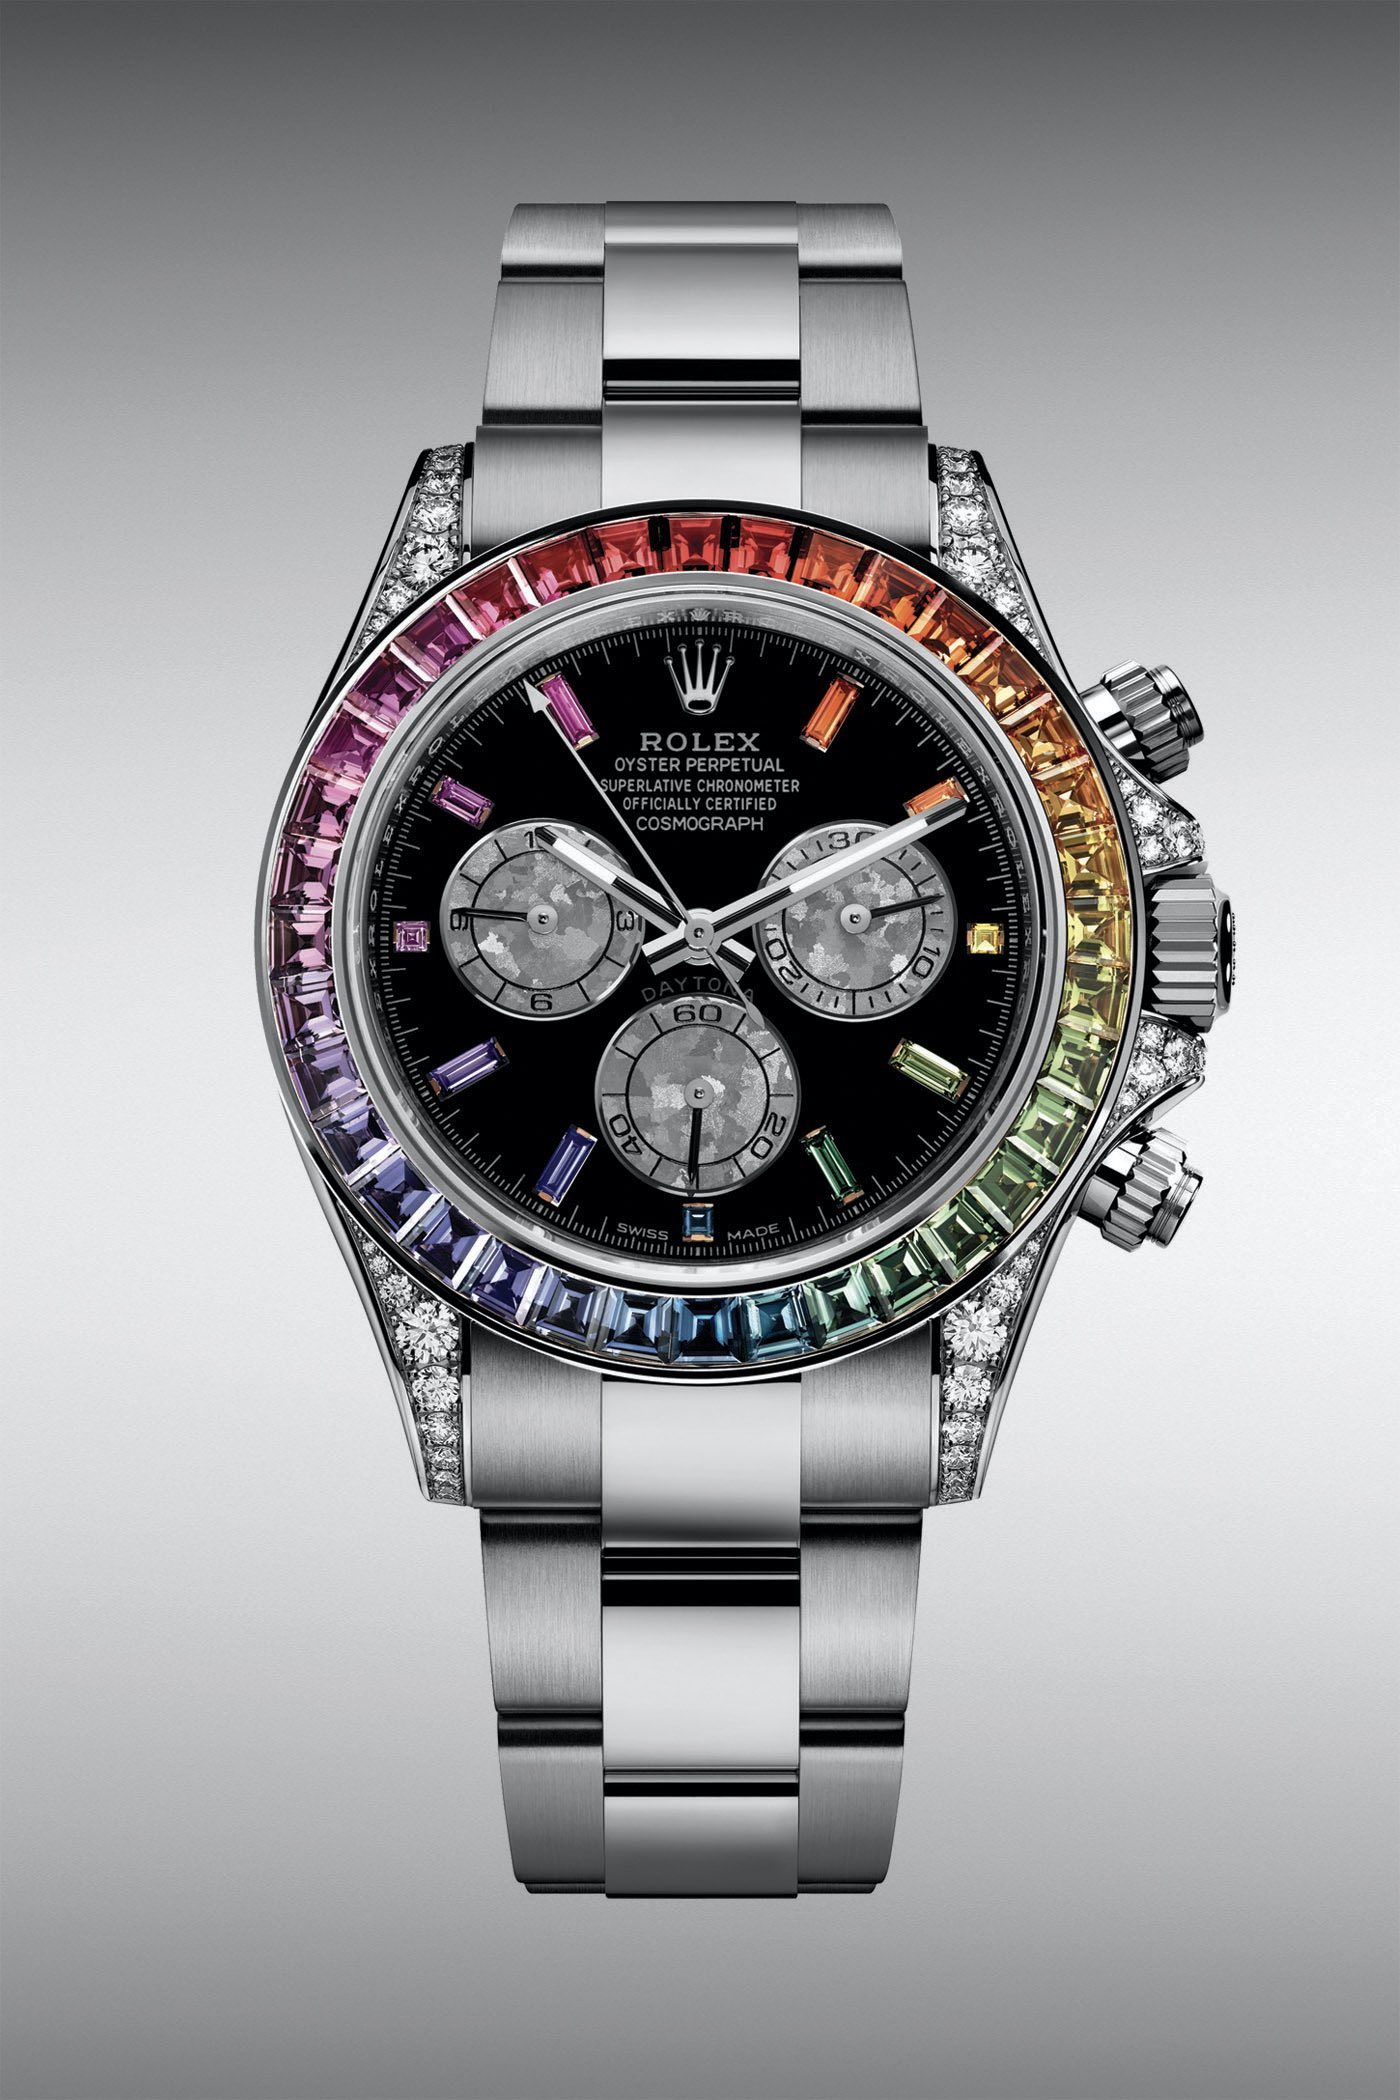 Rolex Daytona Rainbow While Gold 116599RBOW - Rolex Baselworld 2020 - Rolex 2020 Predictions